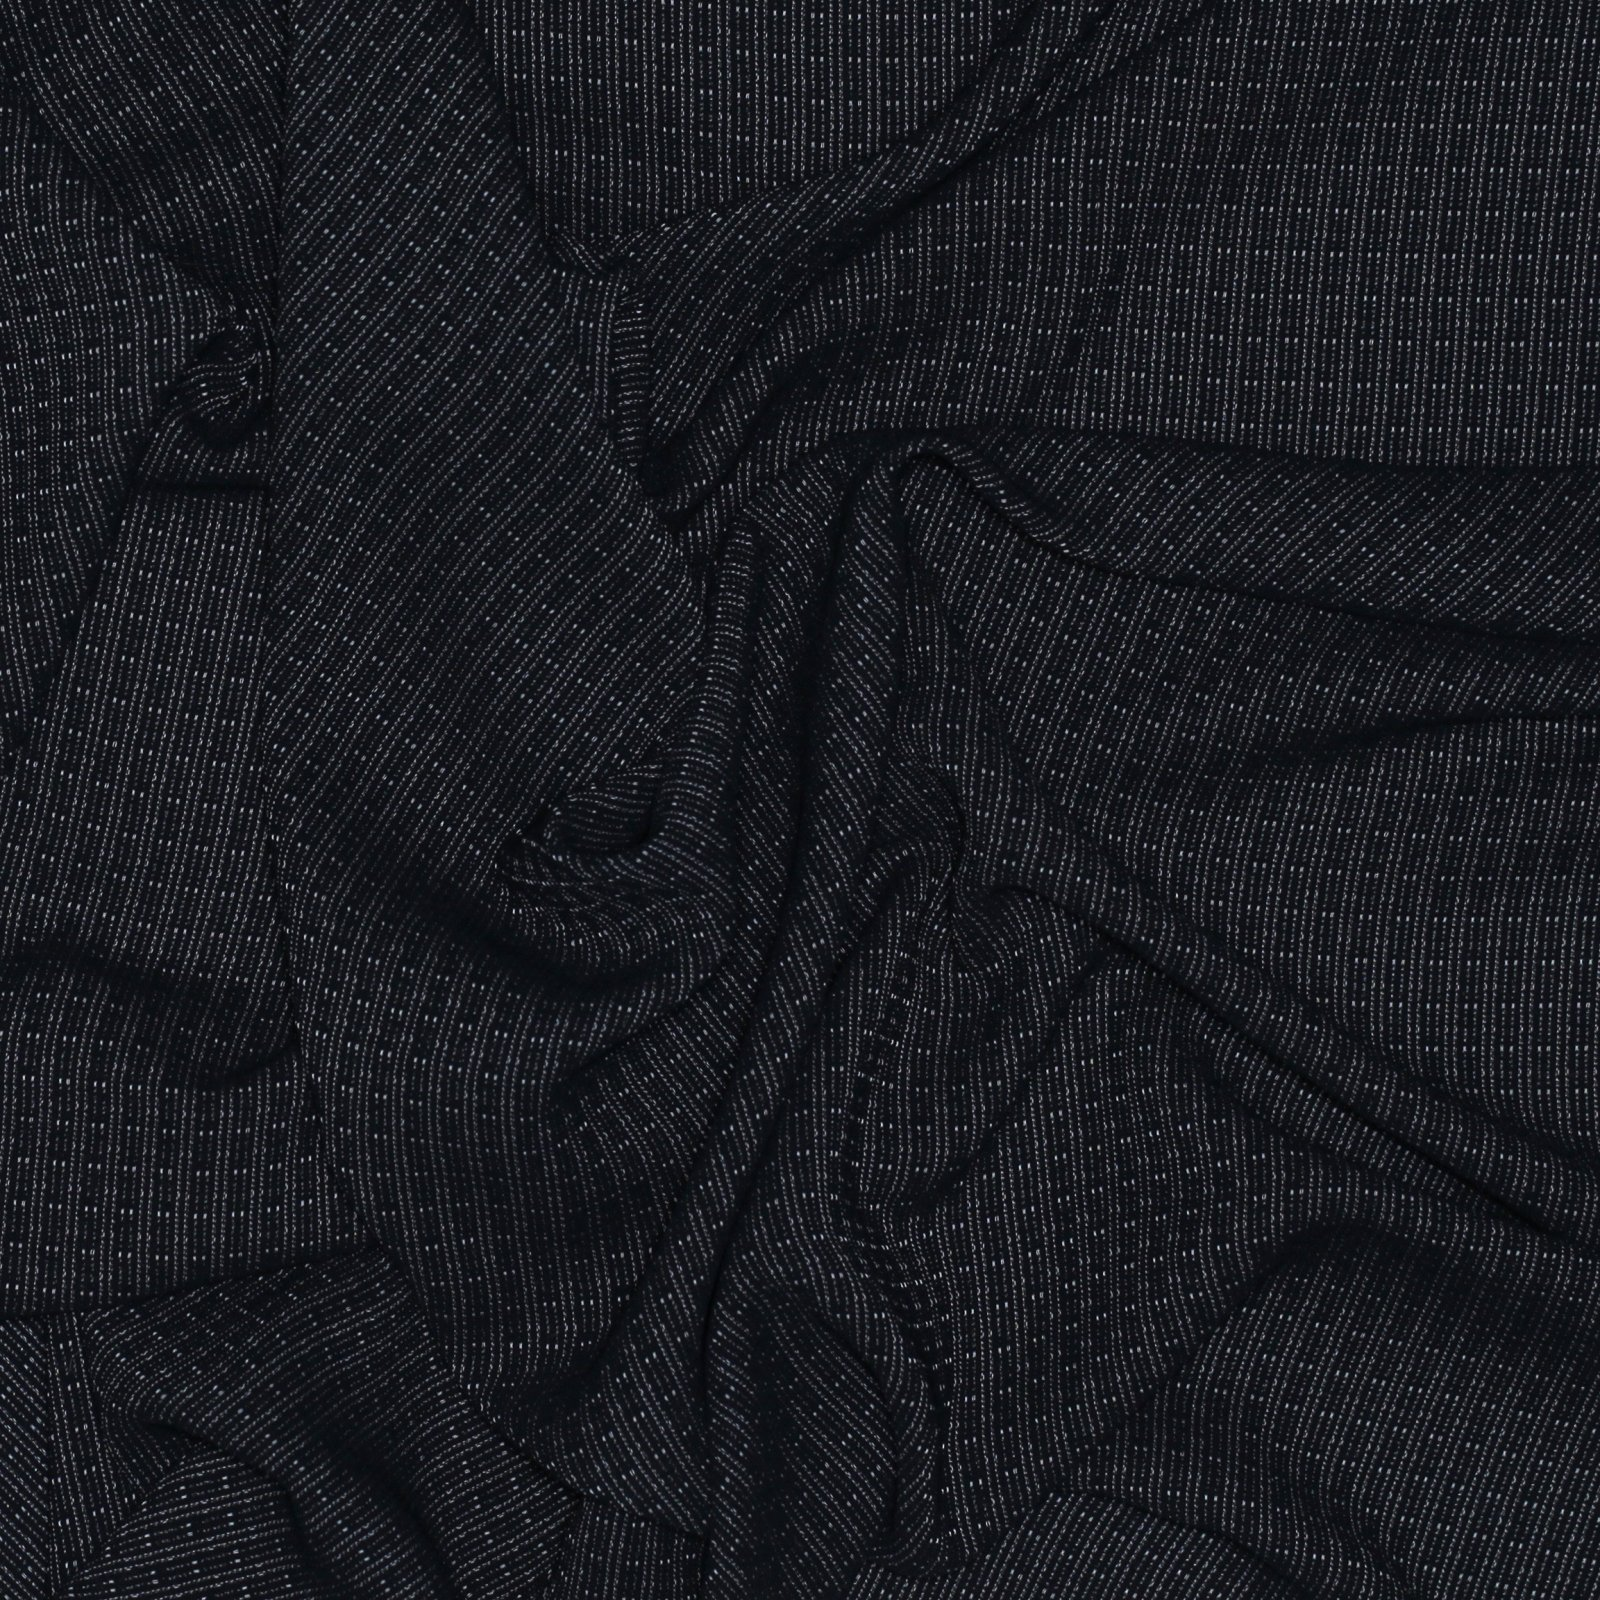 Black w/White Woven Grid Polyester